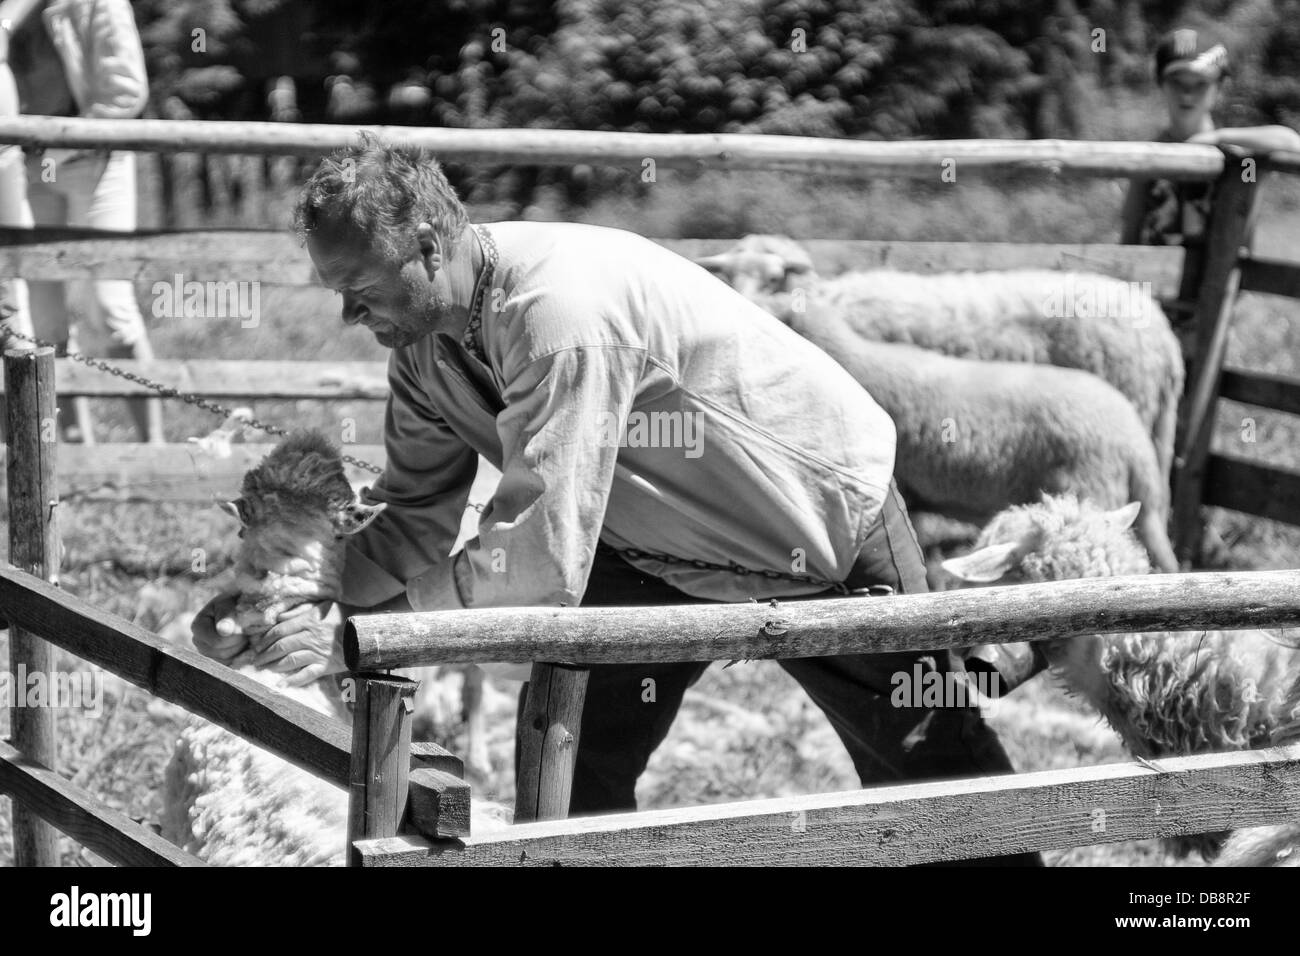 Sheep shearing in open-air museum - Stock Image